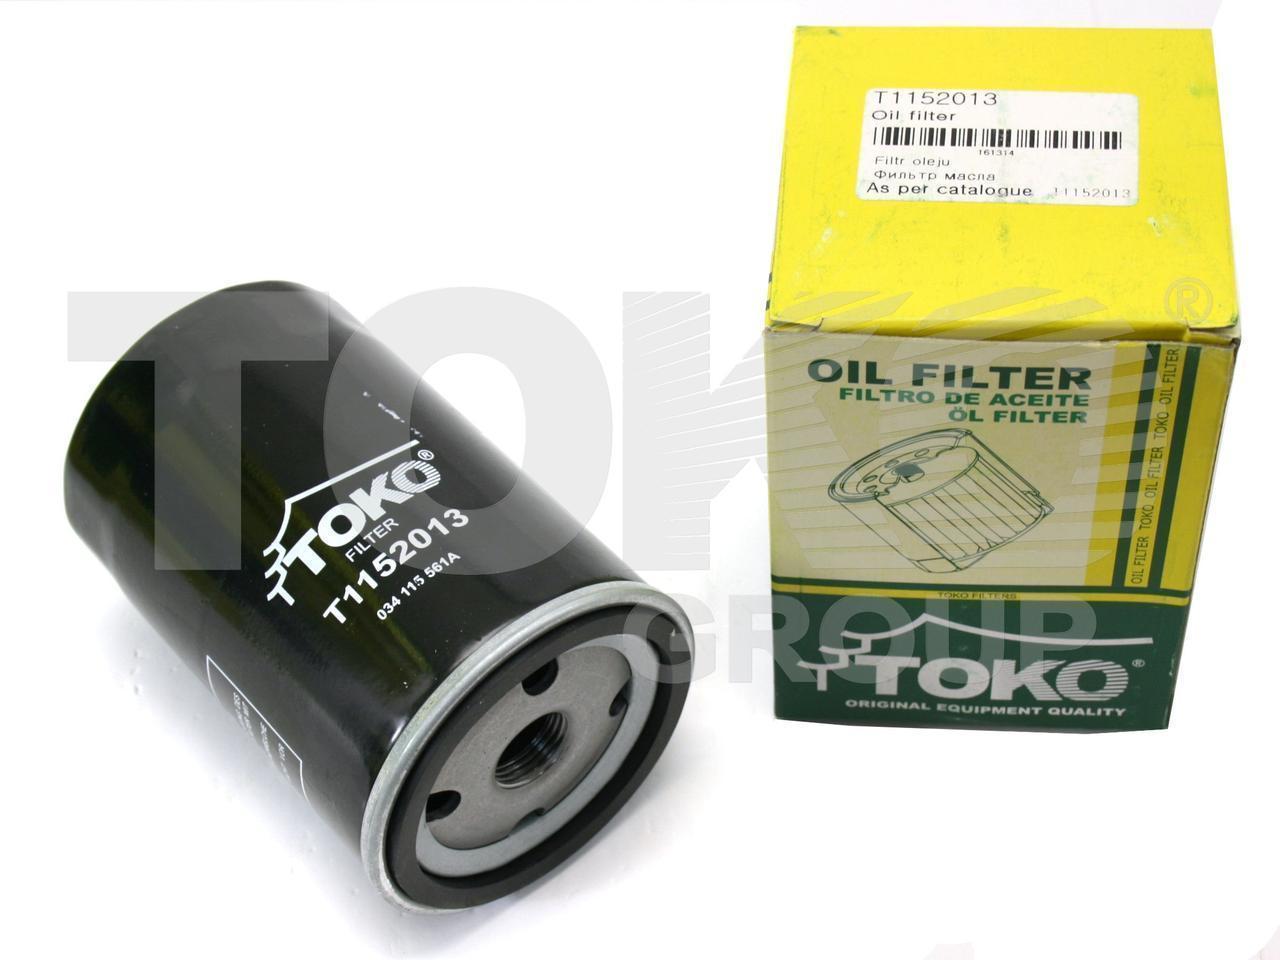 Фильтр масляный Volkswagen VW GOLF IV 06A115561 06A115561B 078115561K 0451103033 OC264| Масляный фильтр Гольф